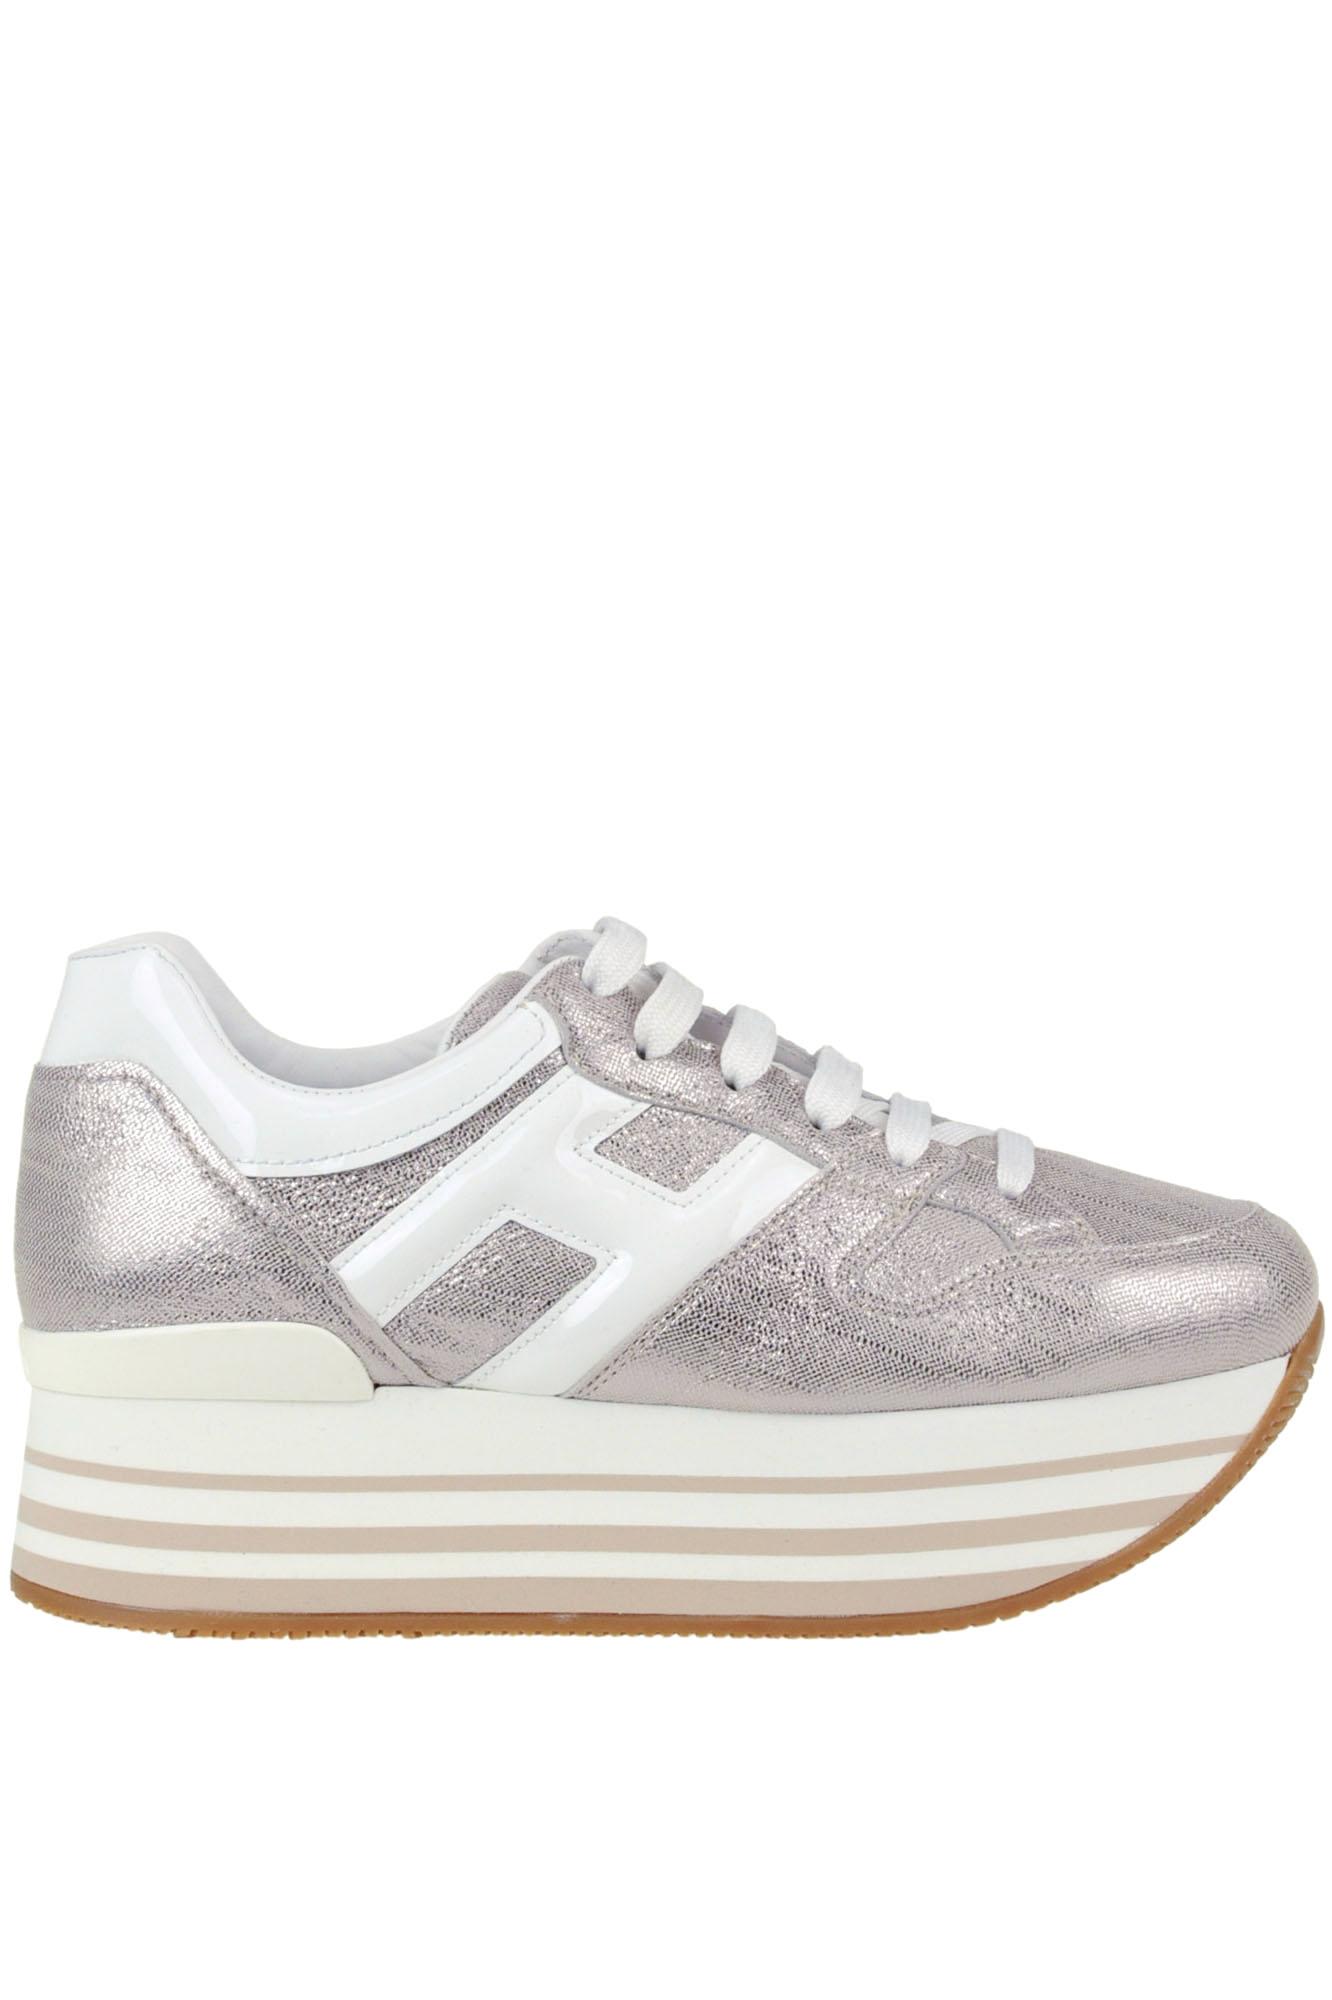 Hogan Maxi 222 H283 Wedge Sneakers In Gray   ModeSens